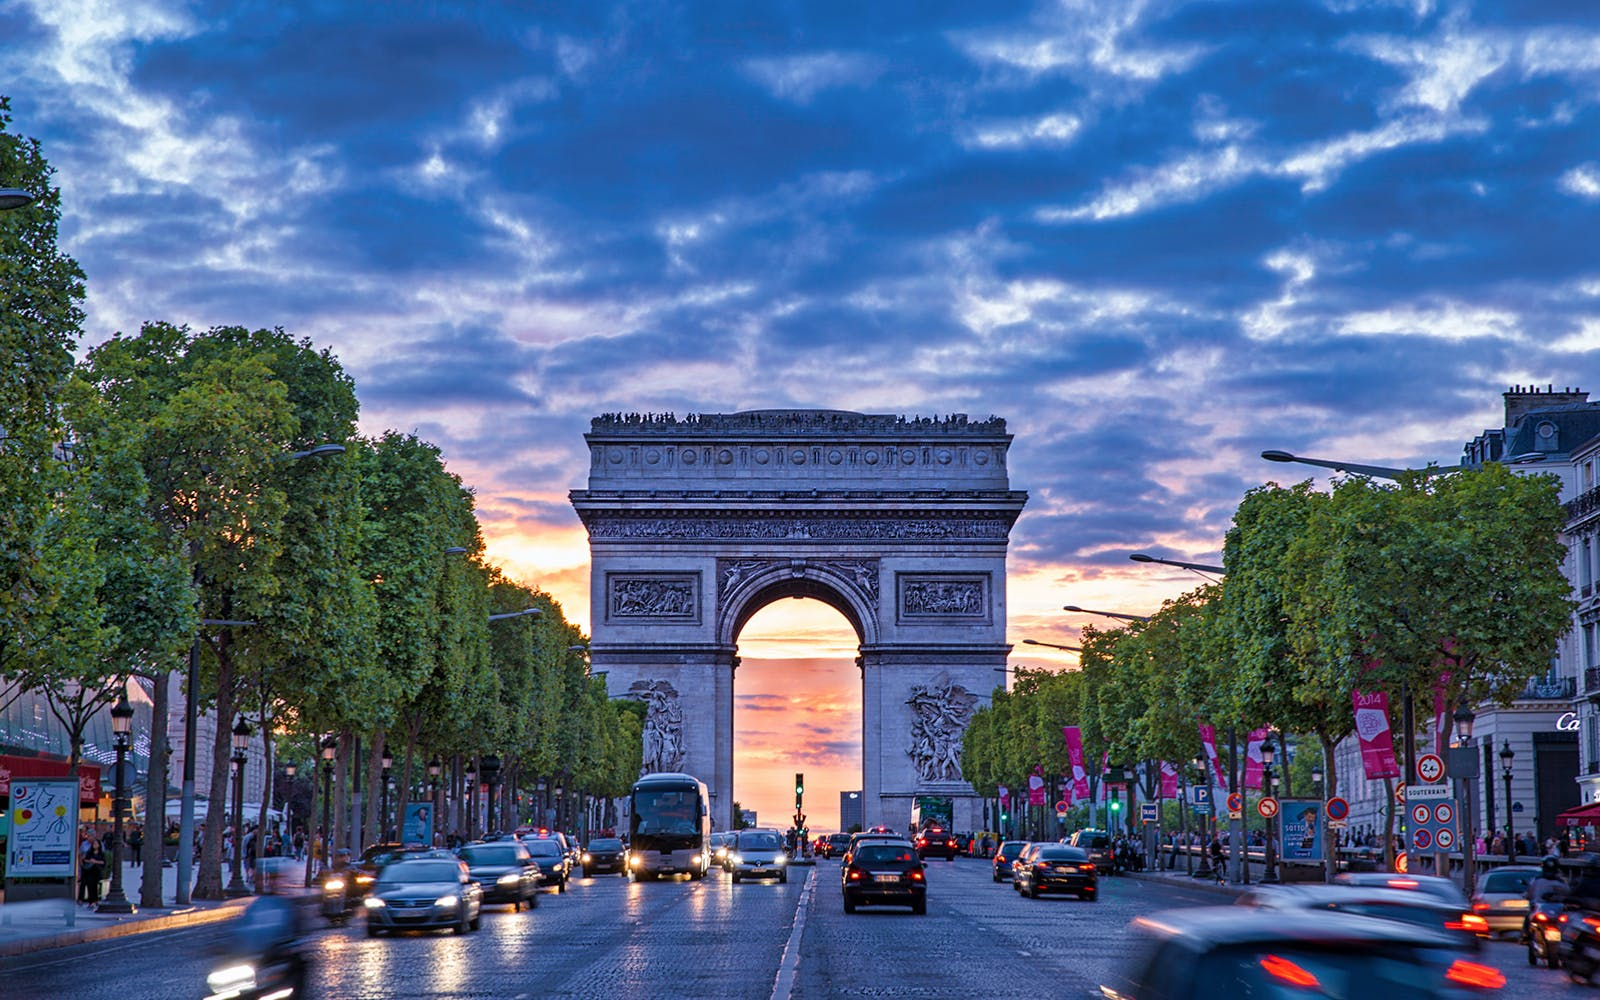 paris in november - Arc de Triomphe